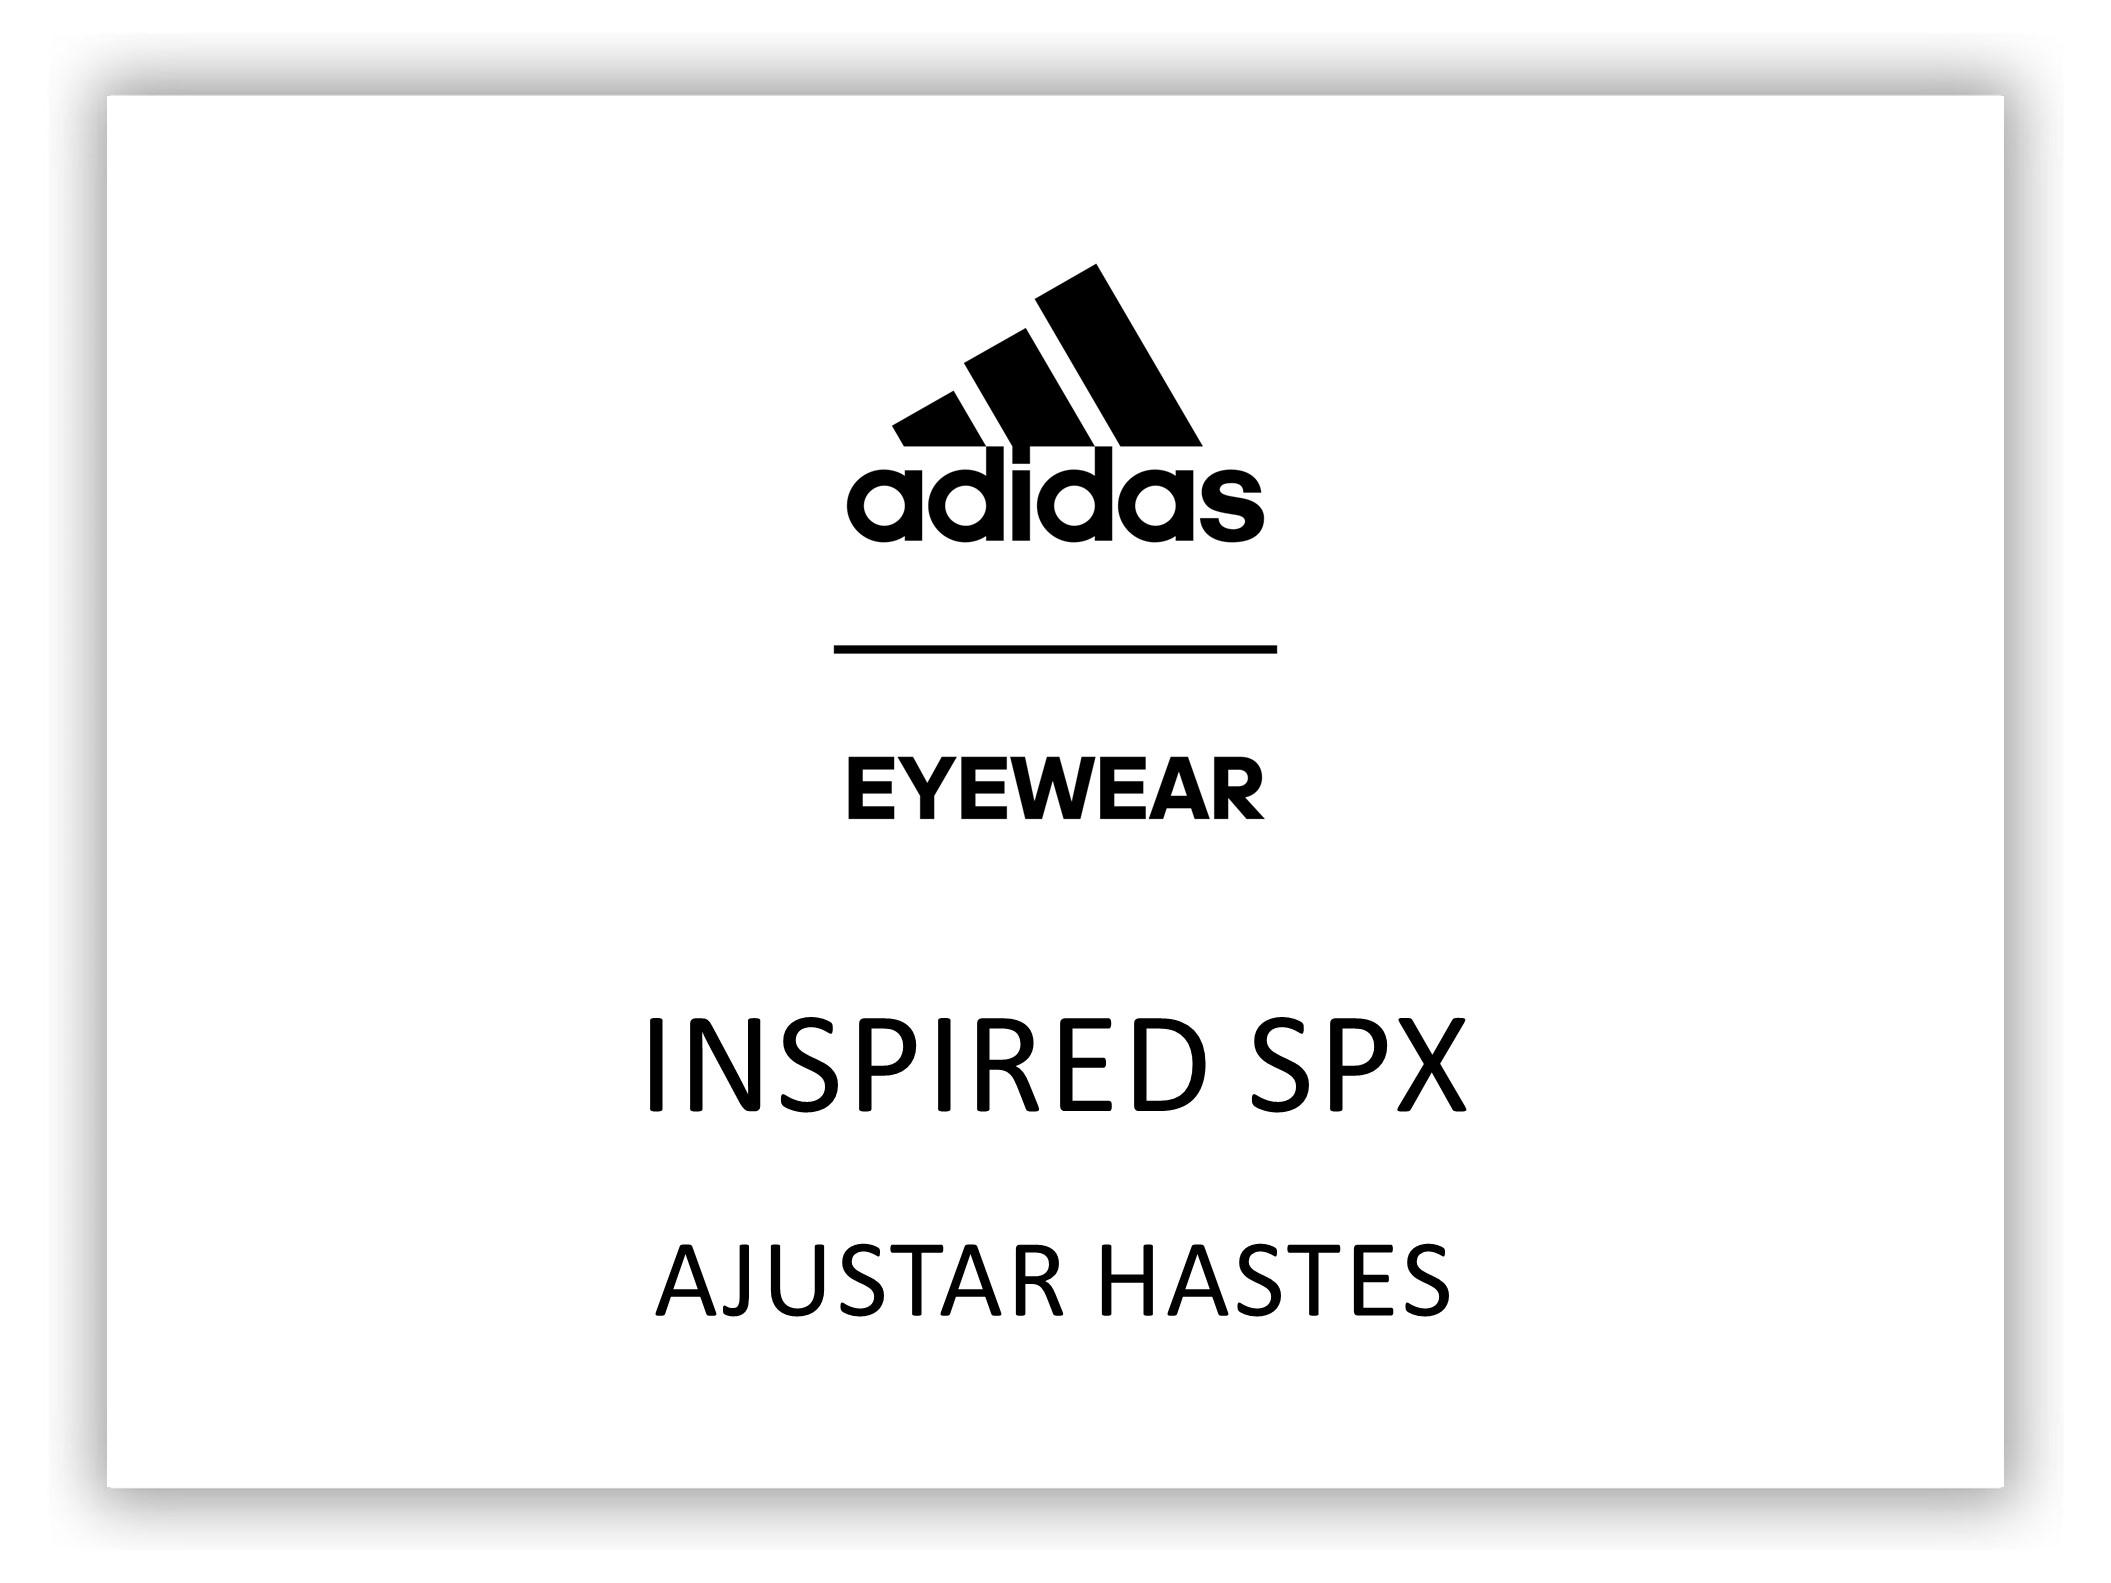 Adidas_capa-inspired SPX-HASTES